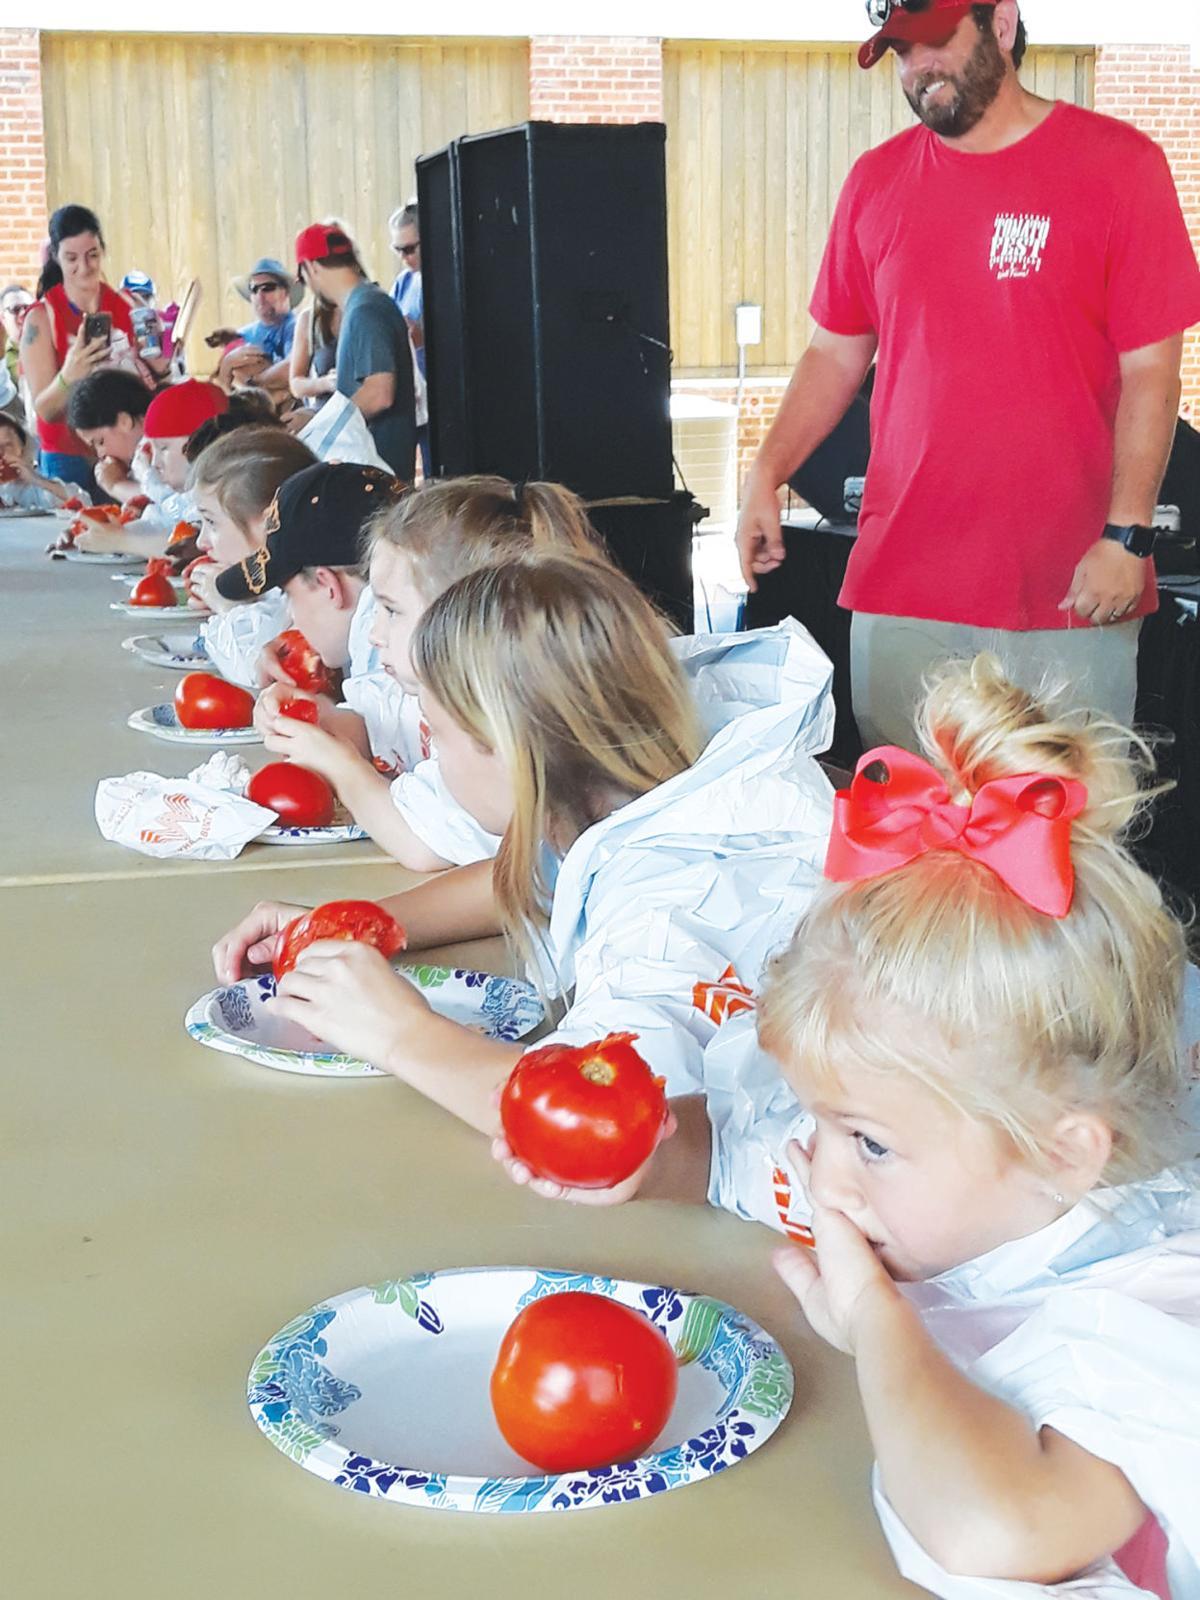 Tomato-eating challenge for kids